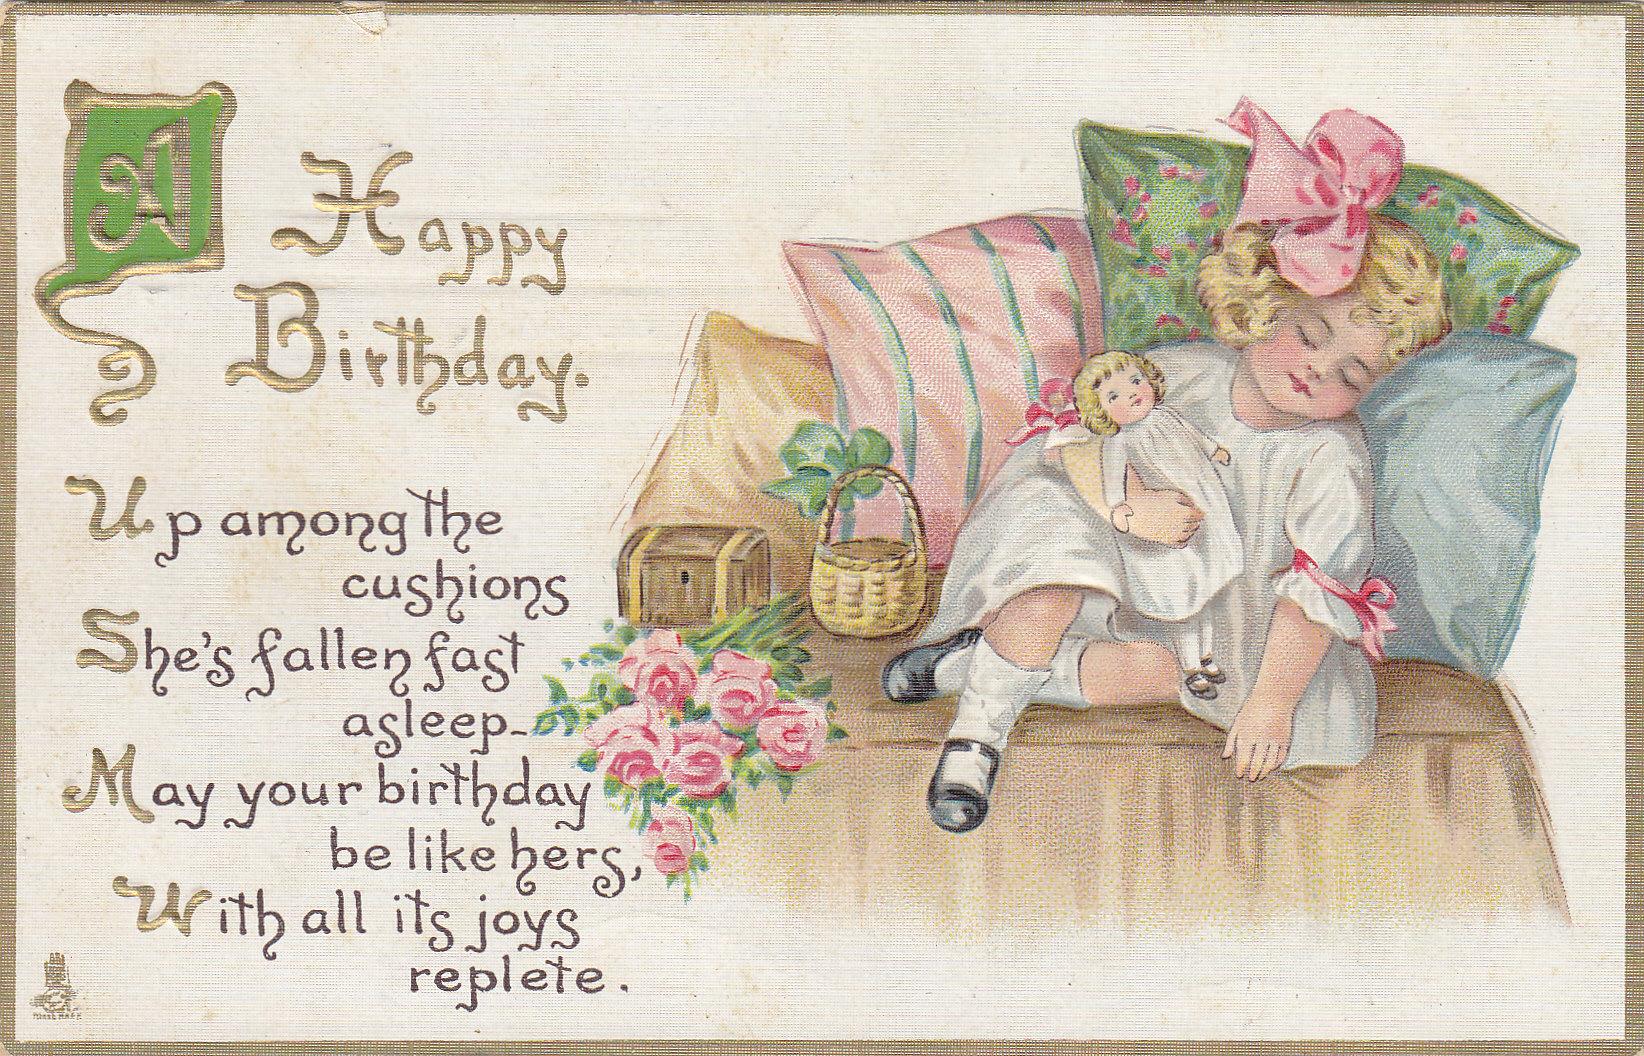 Pin by annemieke kooiman 1 on cards birthday children pin by annemieke kooiman 1 on cards birthday children pinterest cards kristyandbryce Gallery